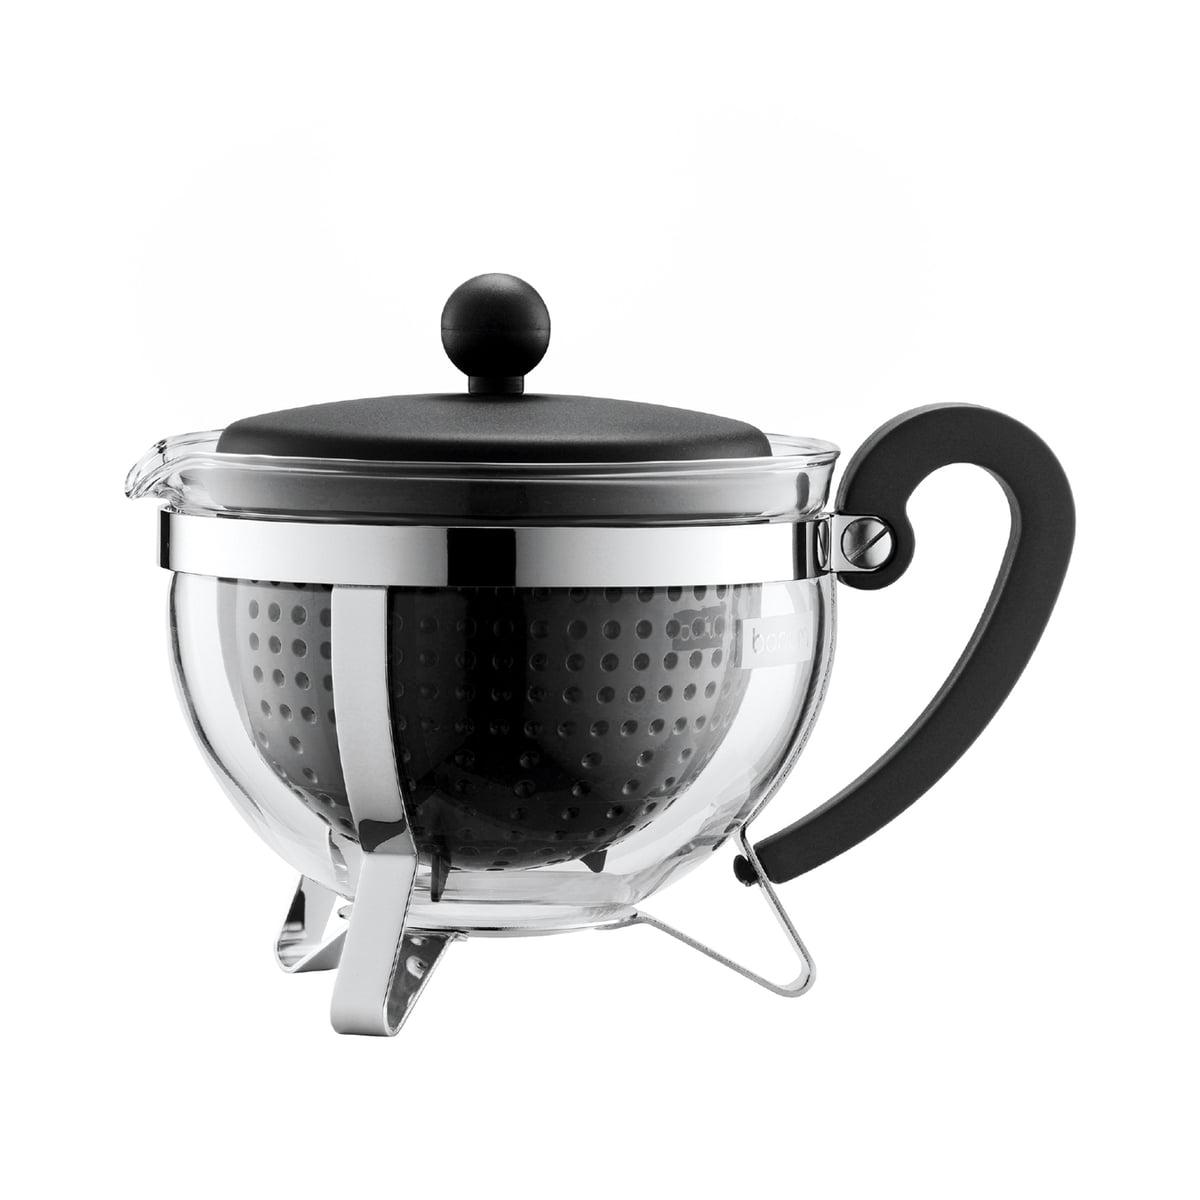 The Chambord Plastic Tea Maker By Bodum